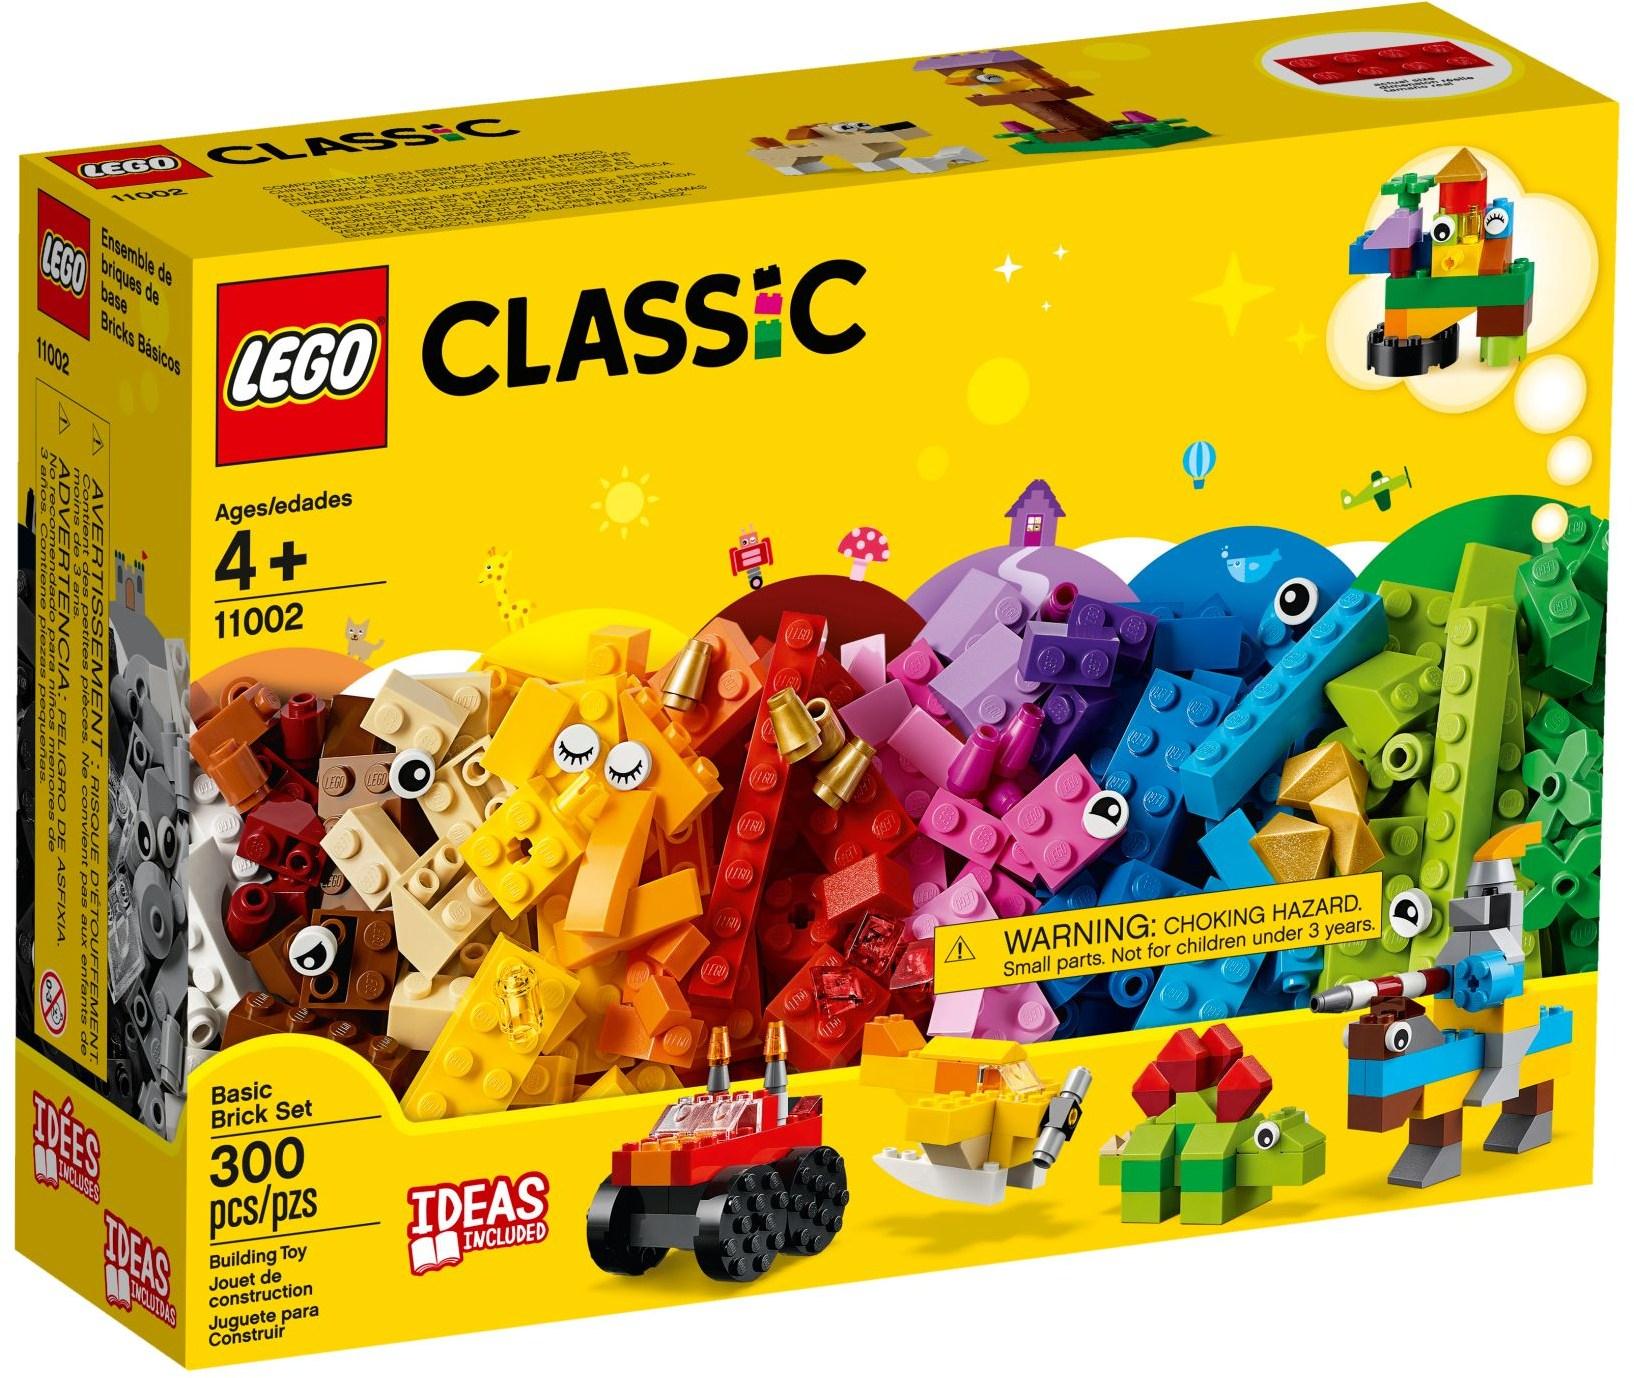 LEGO Classic 11002 Basic Bricks Set - £1.25 @ ASDA (Worcester - confirmed at other stores)